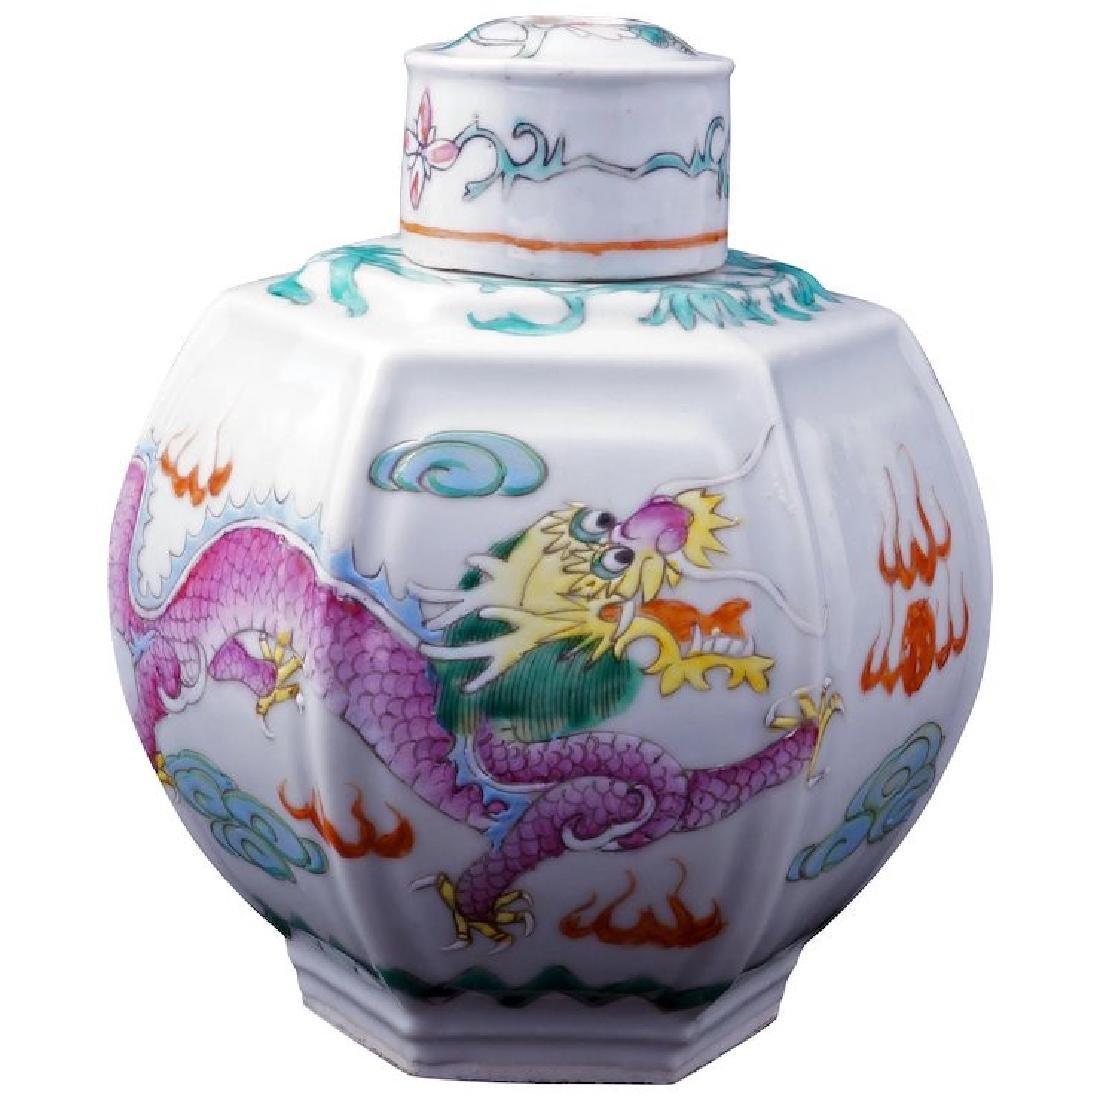 Circa 1900 Chinese porcelain six sided over glaze